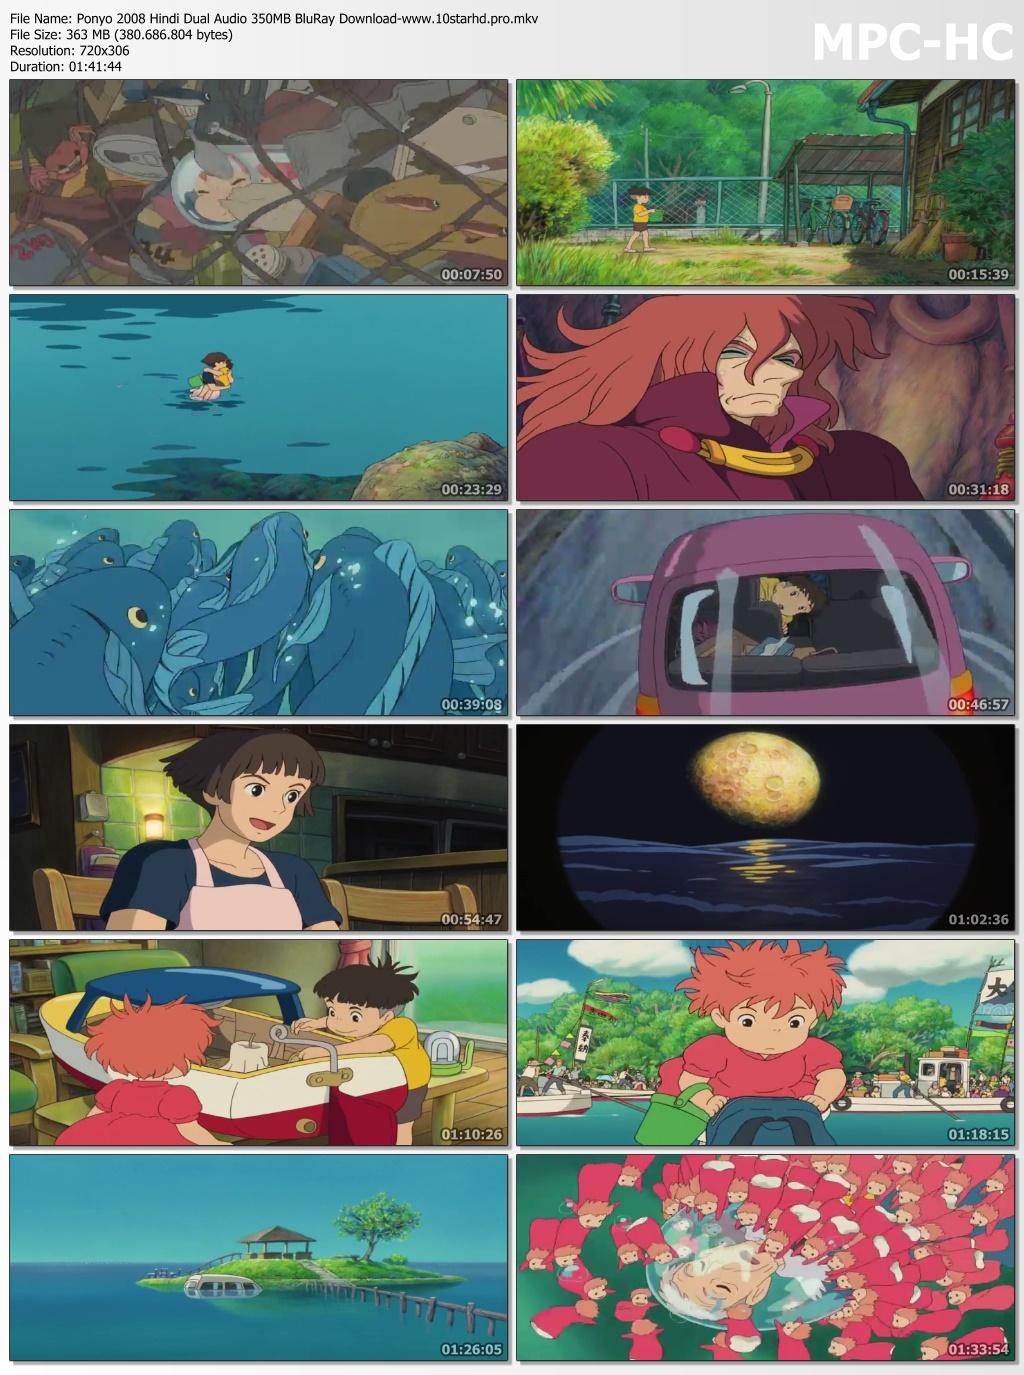 Download Film Ponyo : download, ponyo, Ponyo, Hindi, Audio, 300MB, BluRay, Download, Moviesdada.bid